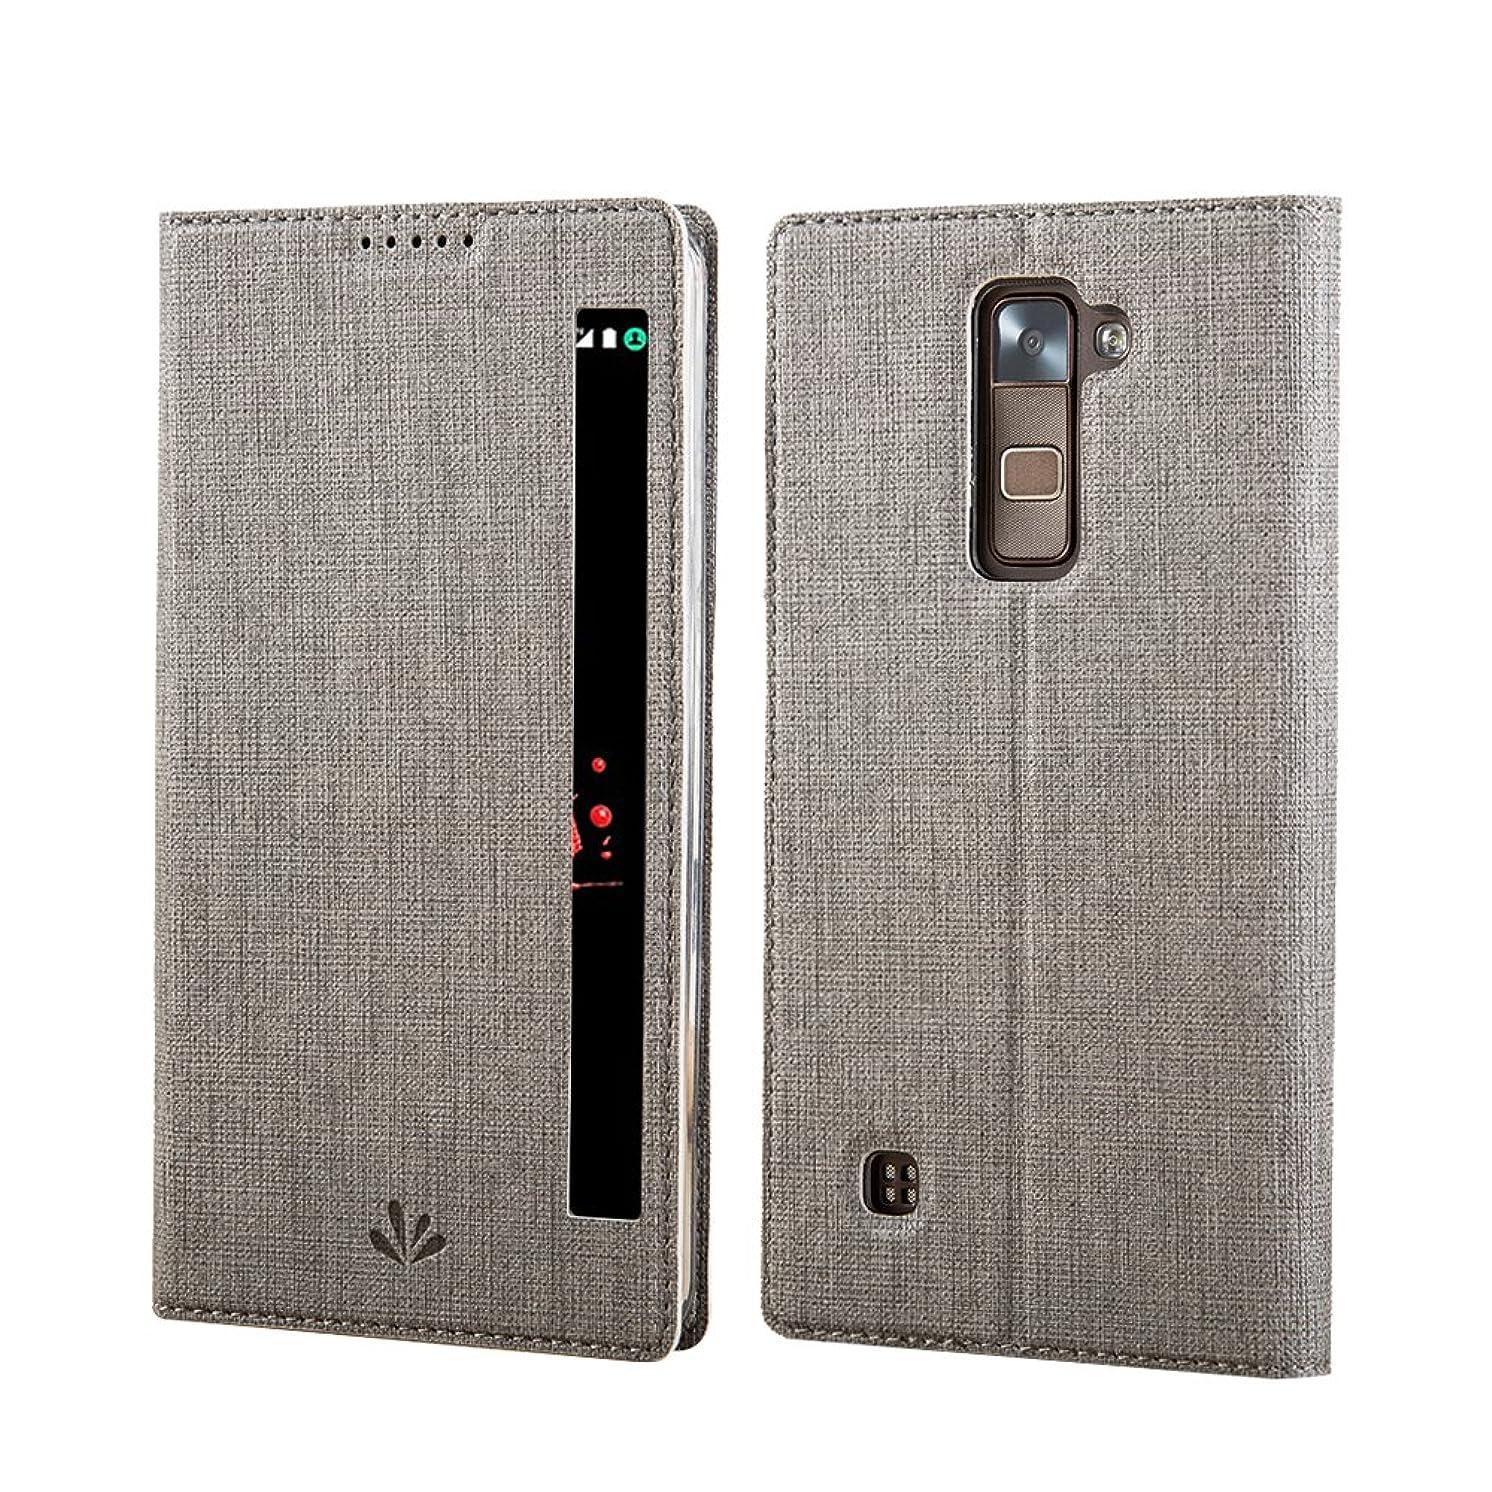 LG Stylus 2 Case, LG G Stylo 2 Case, Feitenn S-View Window Folio Flip PU leather wallet Case Stand Kickstand wallet Card Holster Slim Fit case LG Stylo 2/Stylus 2 Case (Gray)